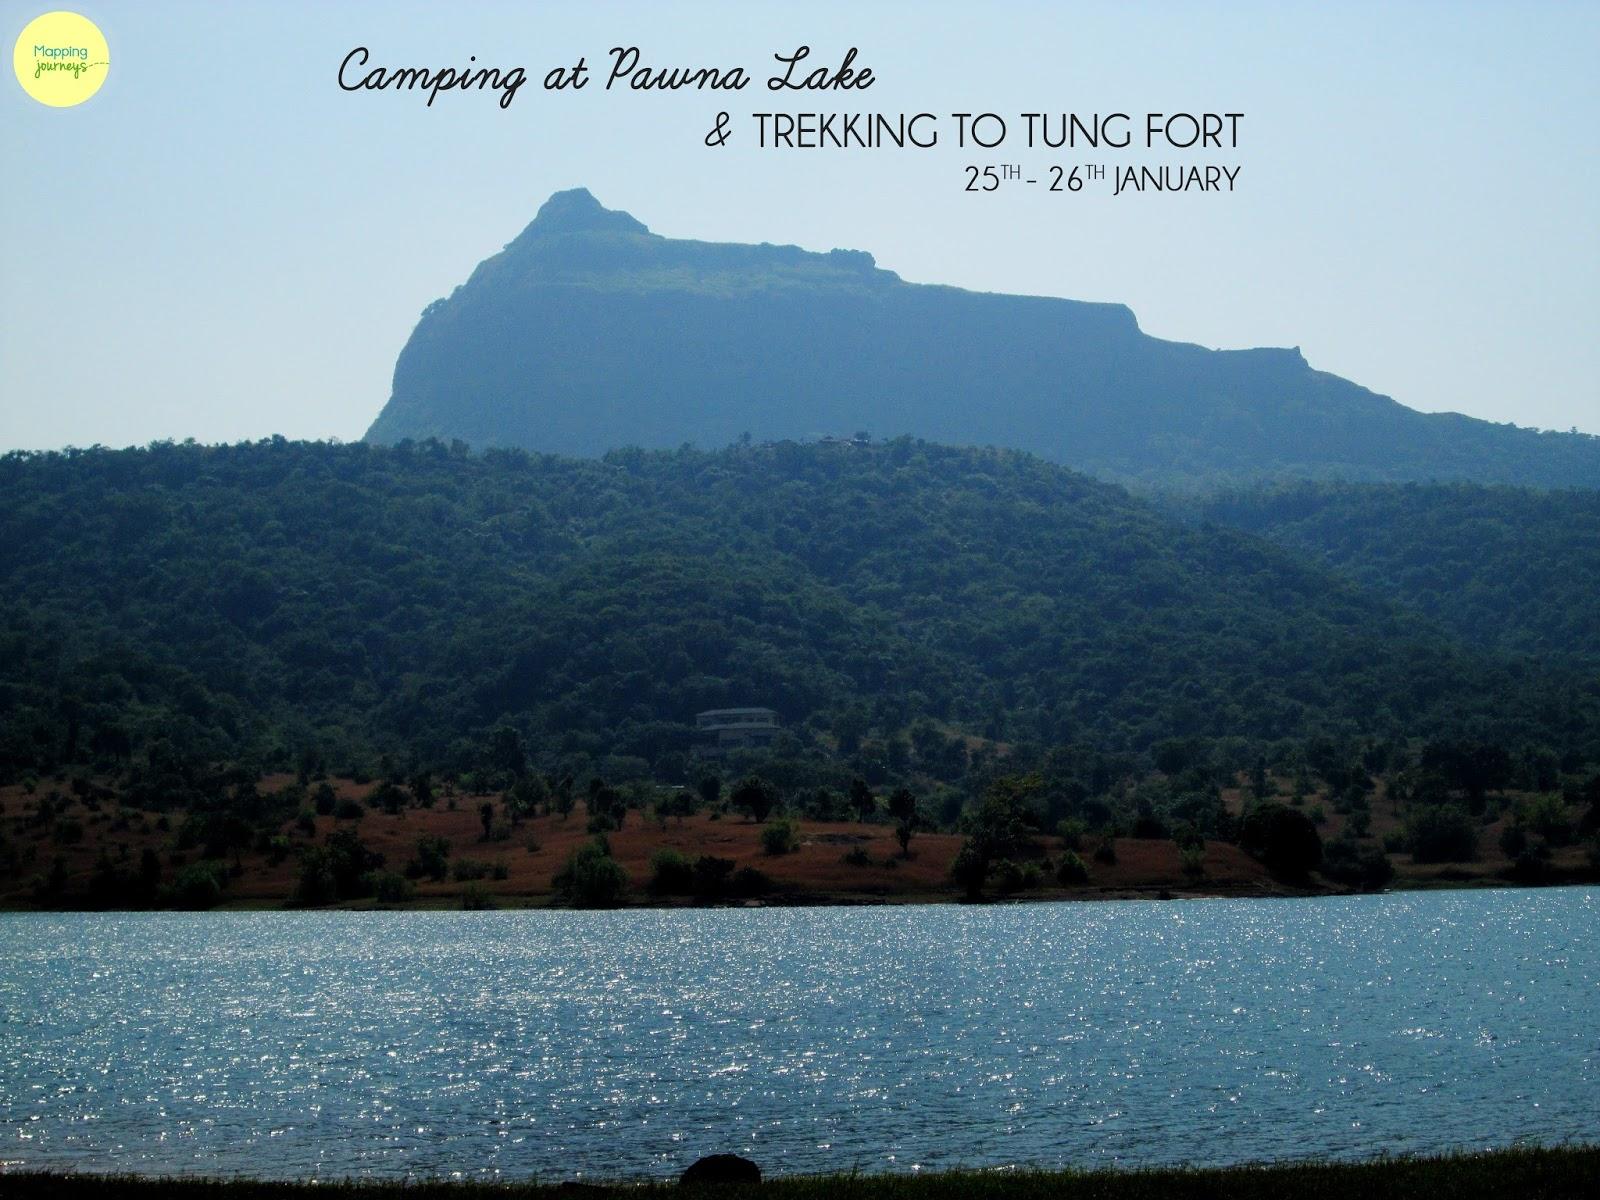 Camping at Pawna Dam and Trekking to Tung Fort !